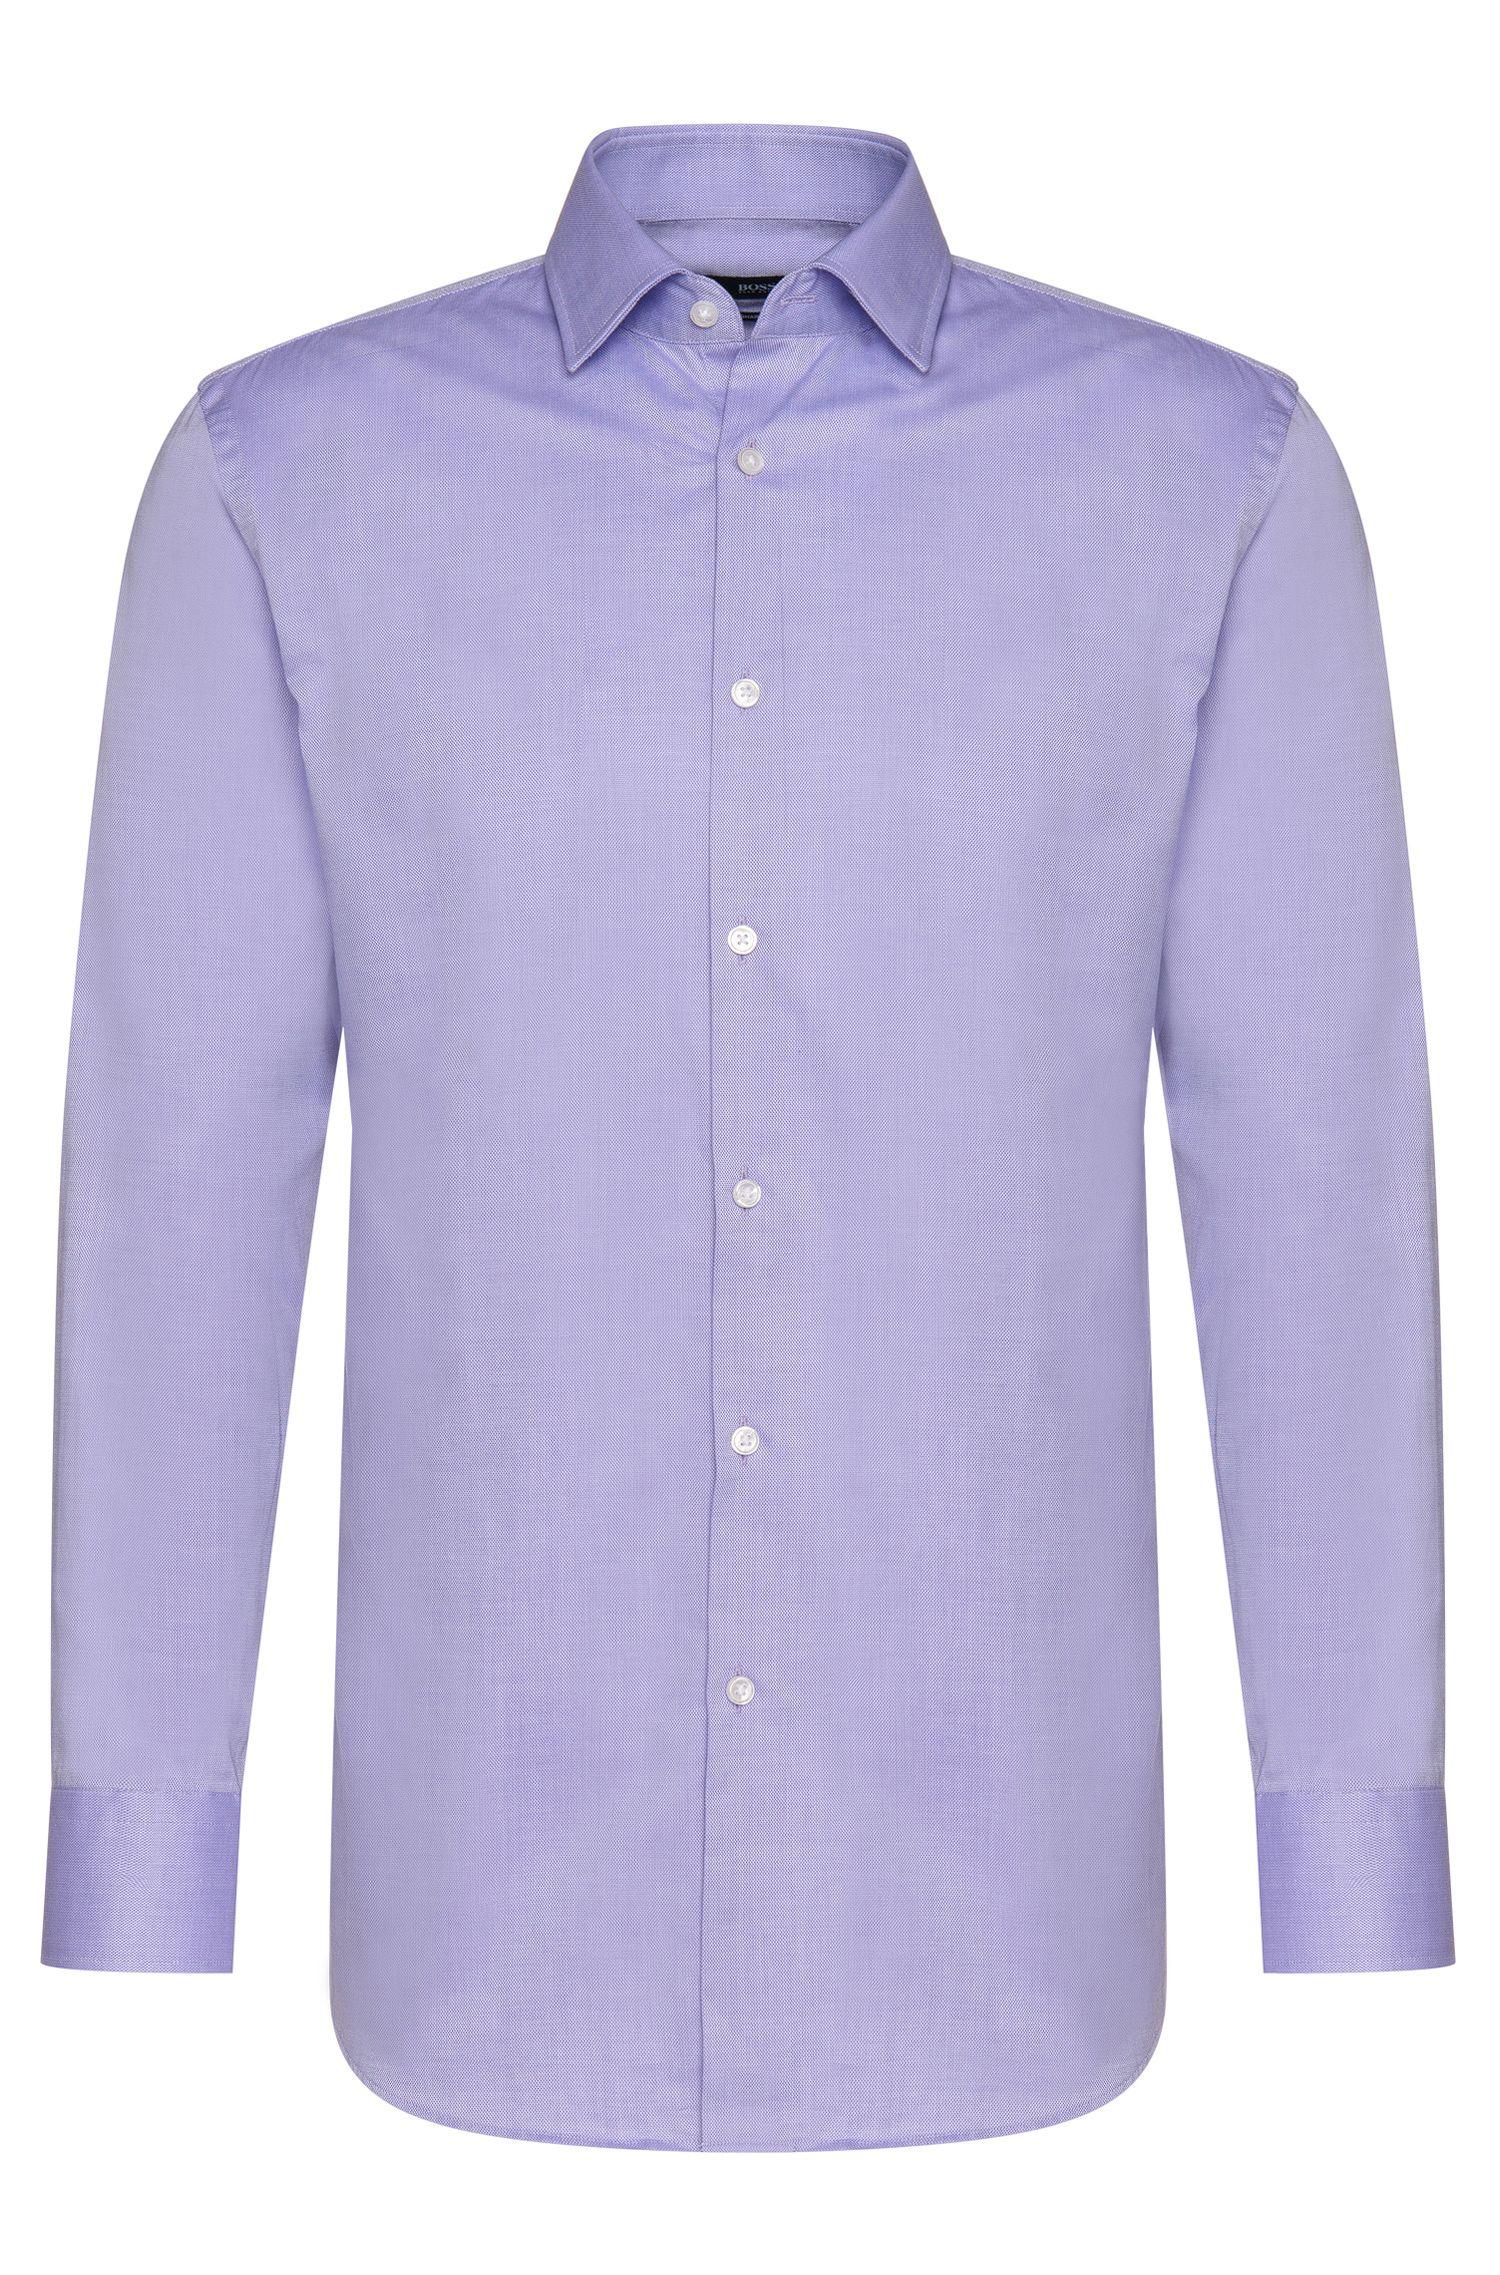 'Marley US' | Sharp Fit, Cotton Dress Shirt